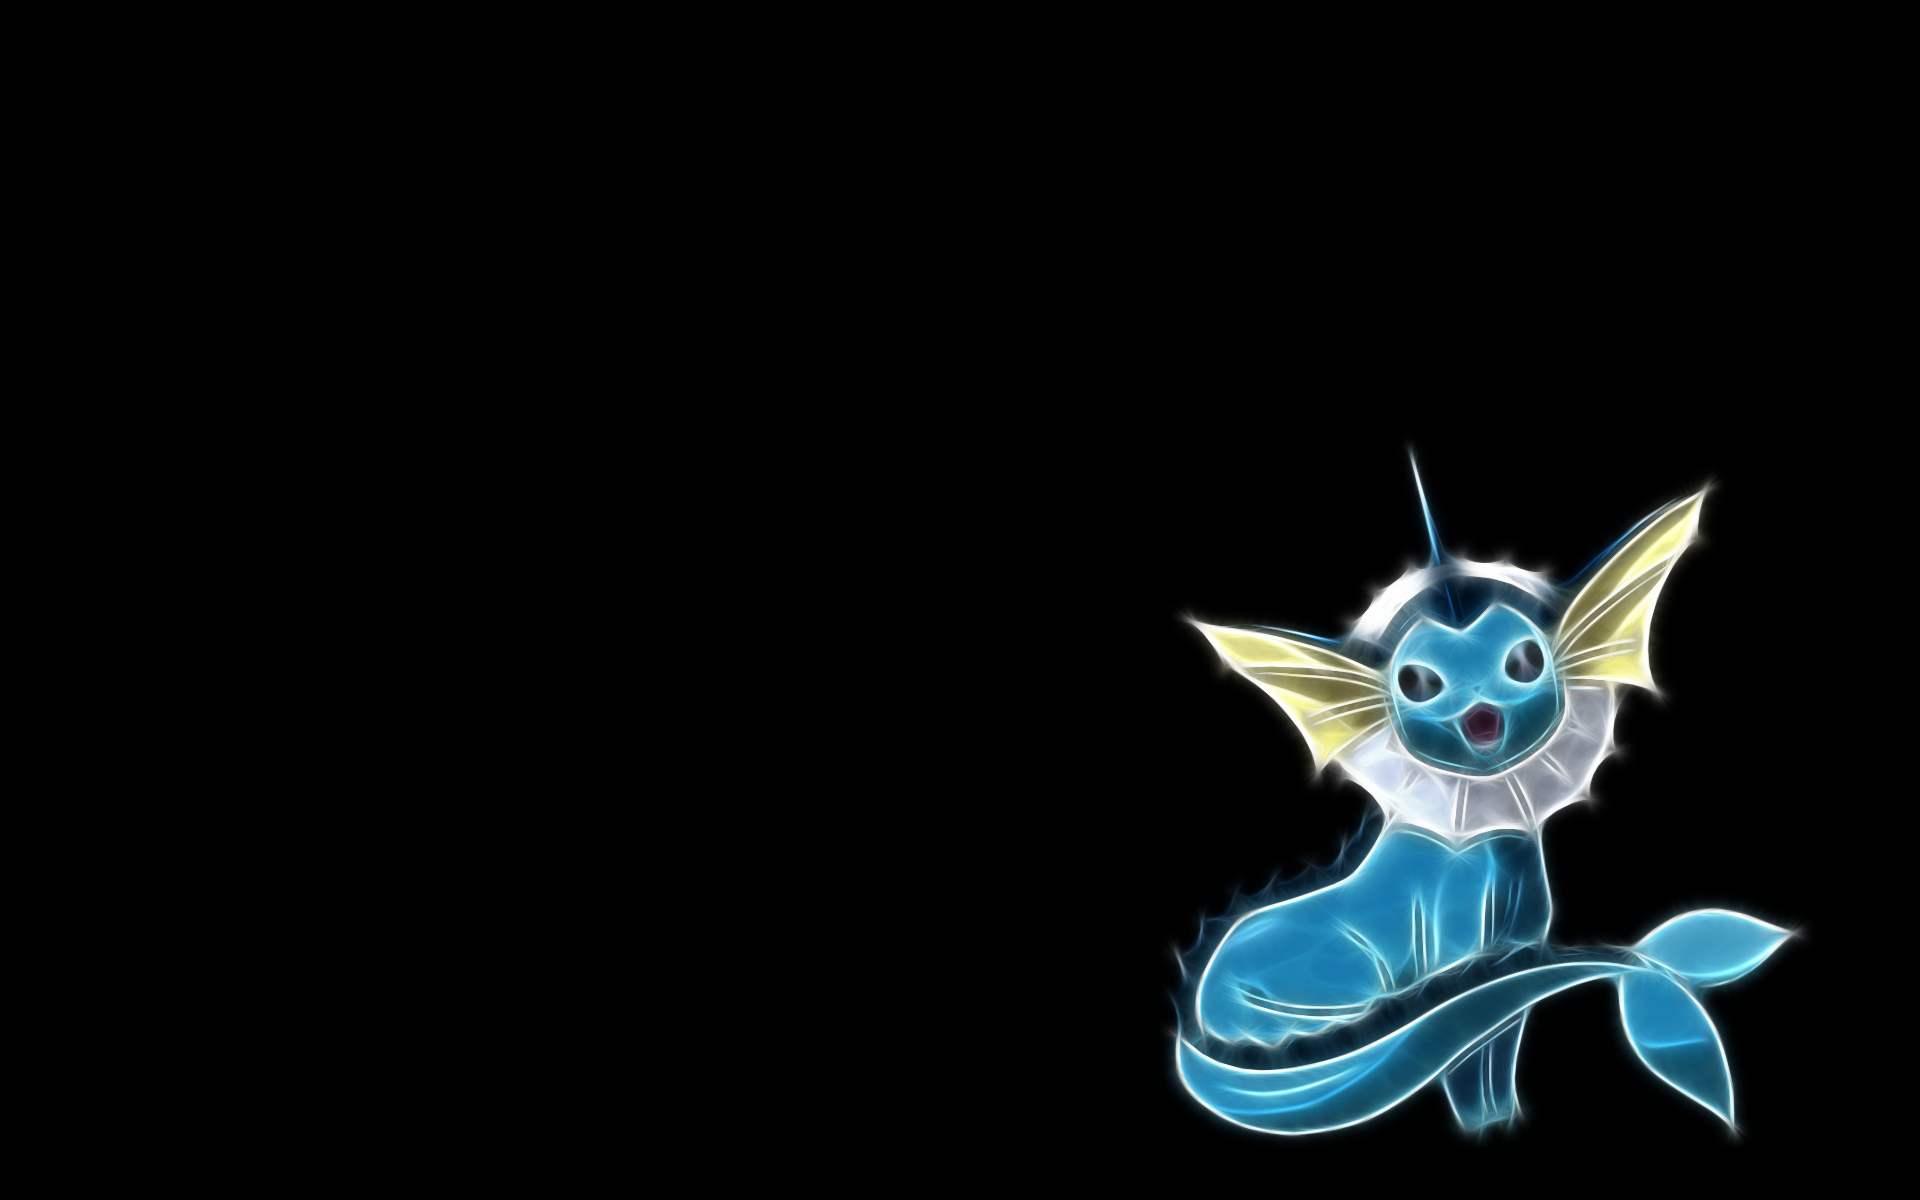 Download the Pokemon anime wallpaper titled Vaporeon 1920x1200